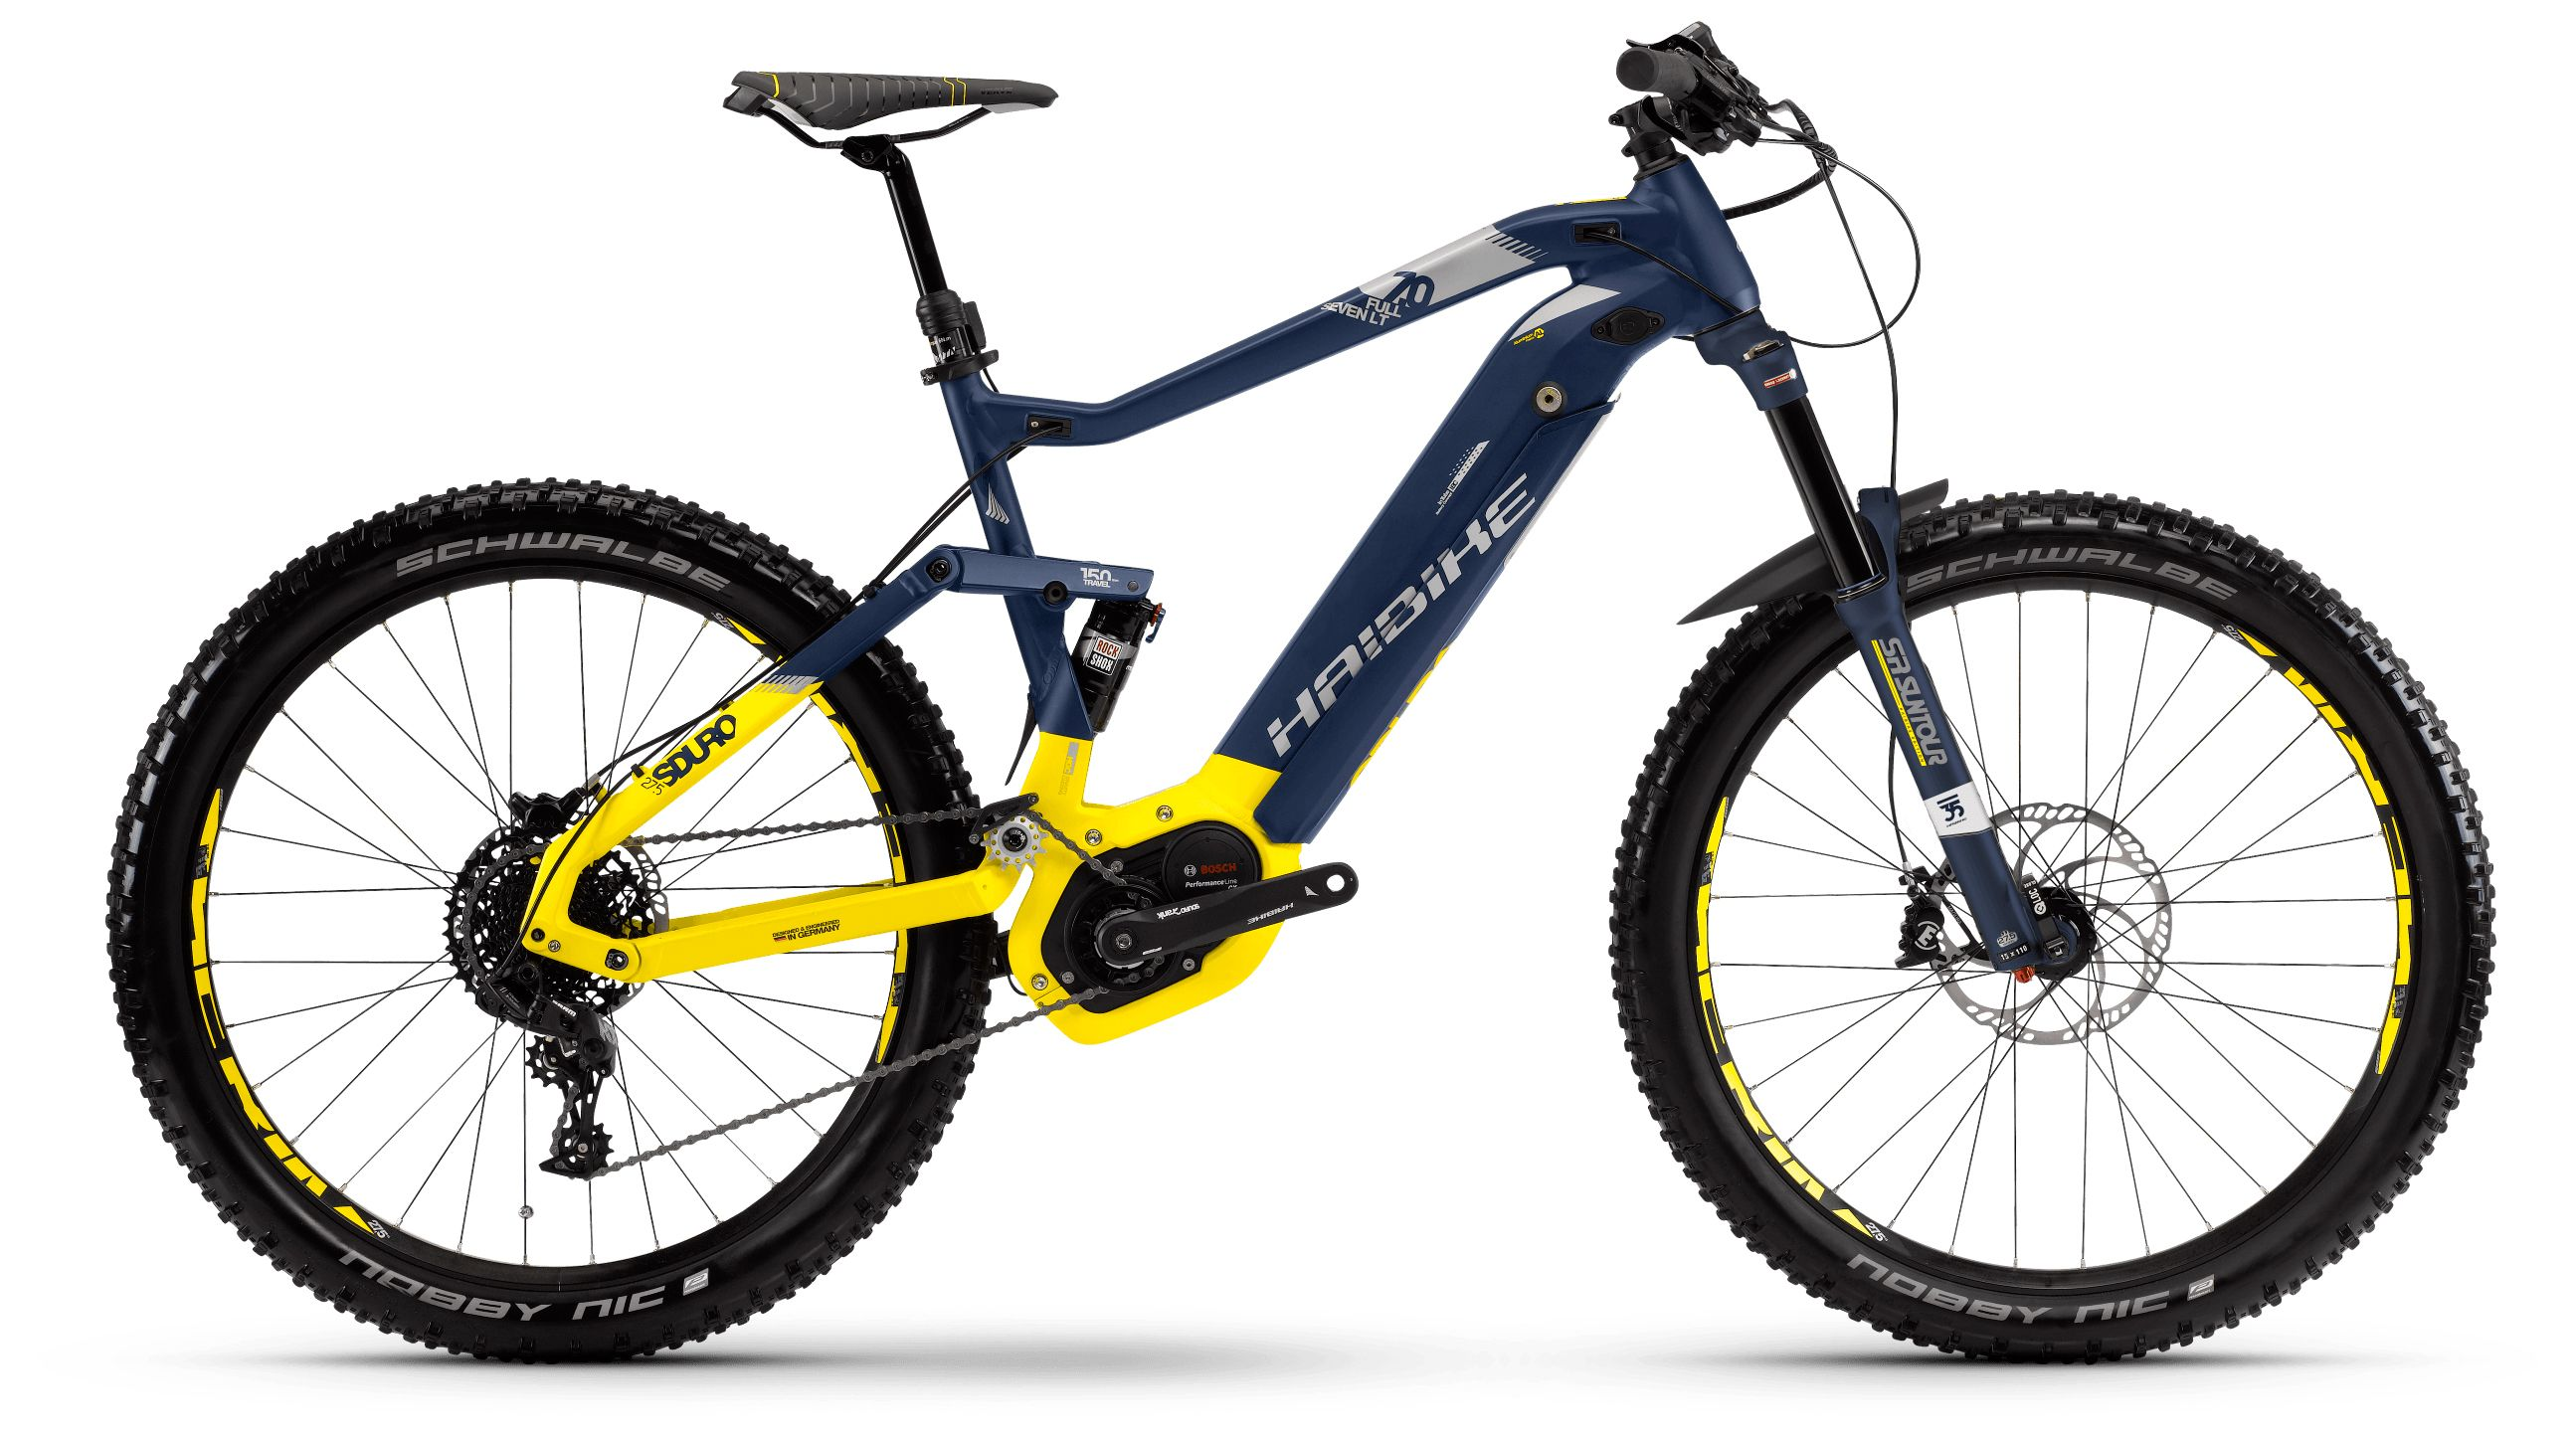 Велосипед Haibike Sduro FullSeven LT 7.0 500Wh 11s NX 2018